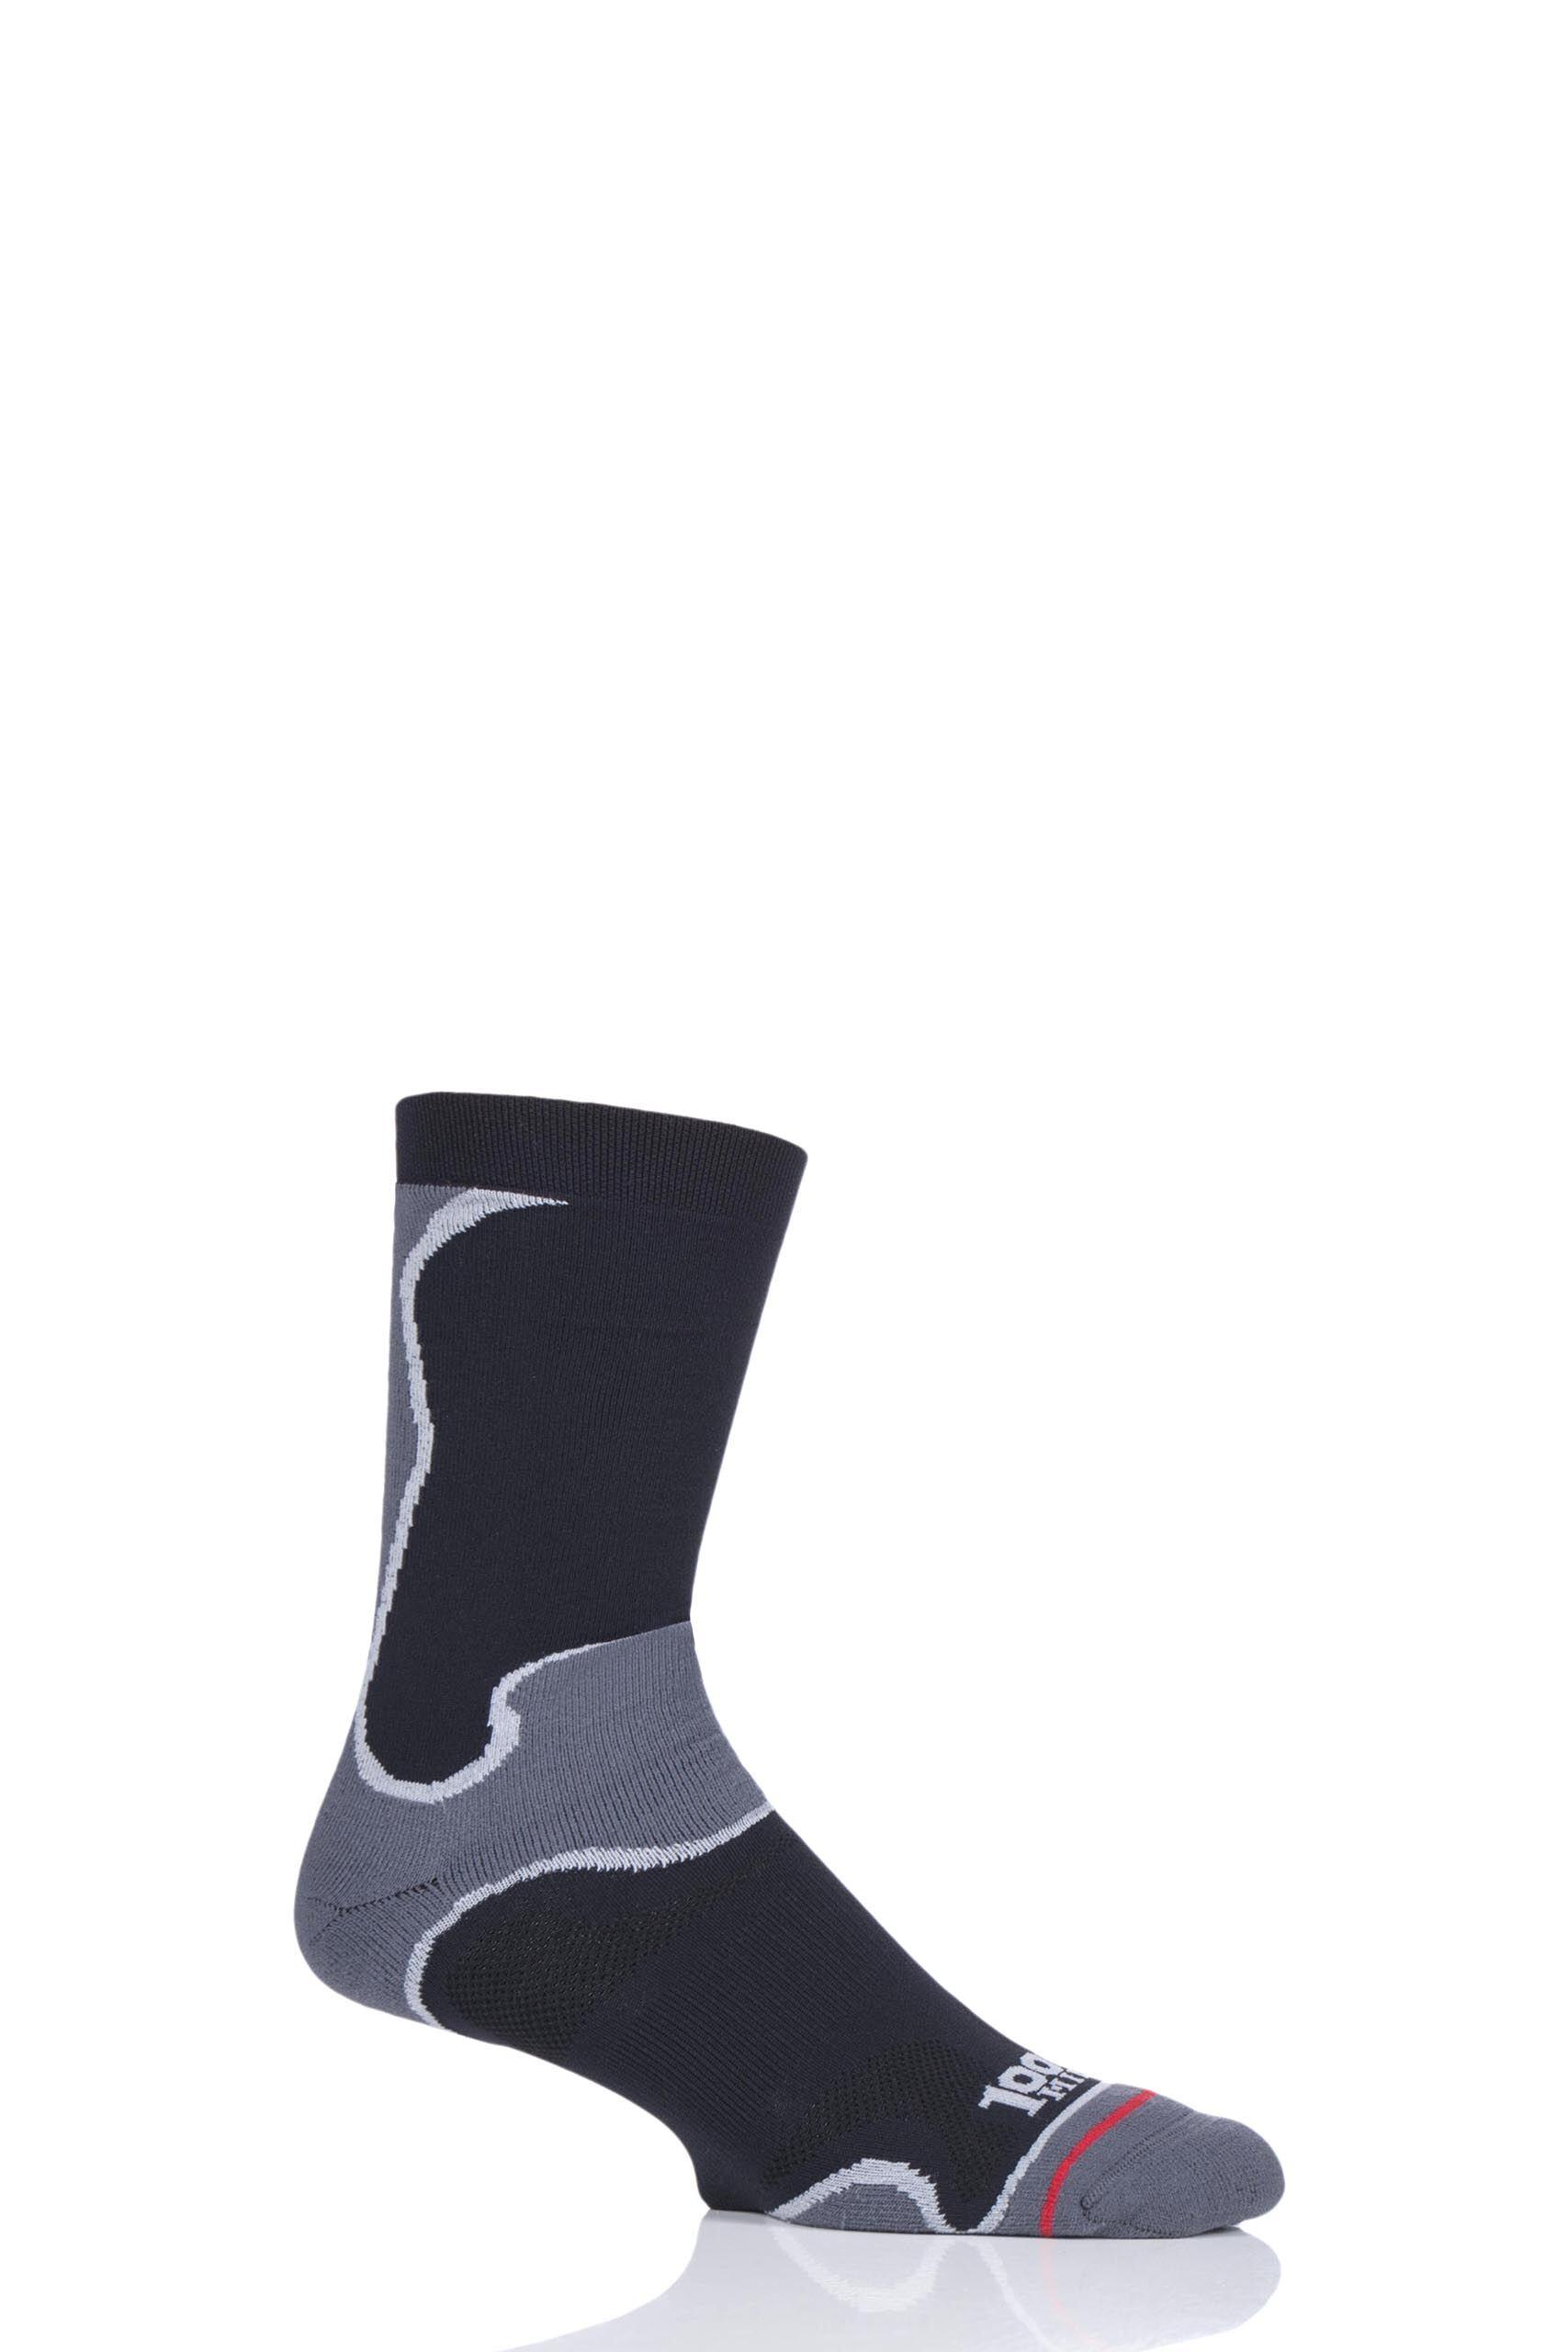 Image of 1 Pair Black Athletic Fusion Socks Unisex 9-11.5 Mens - 1000 Mile